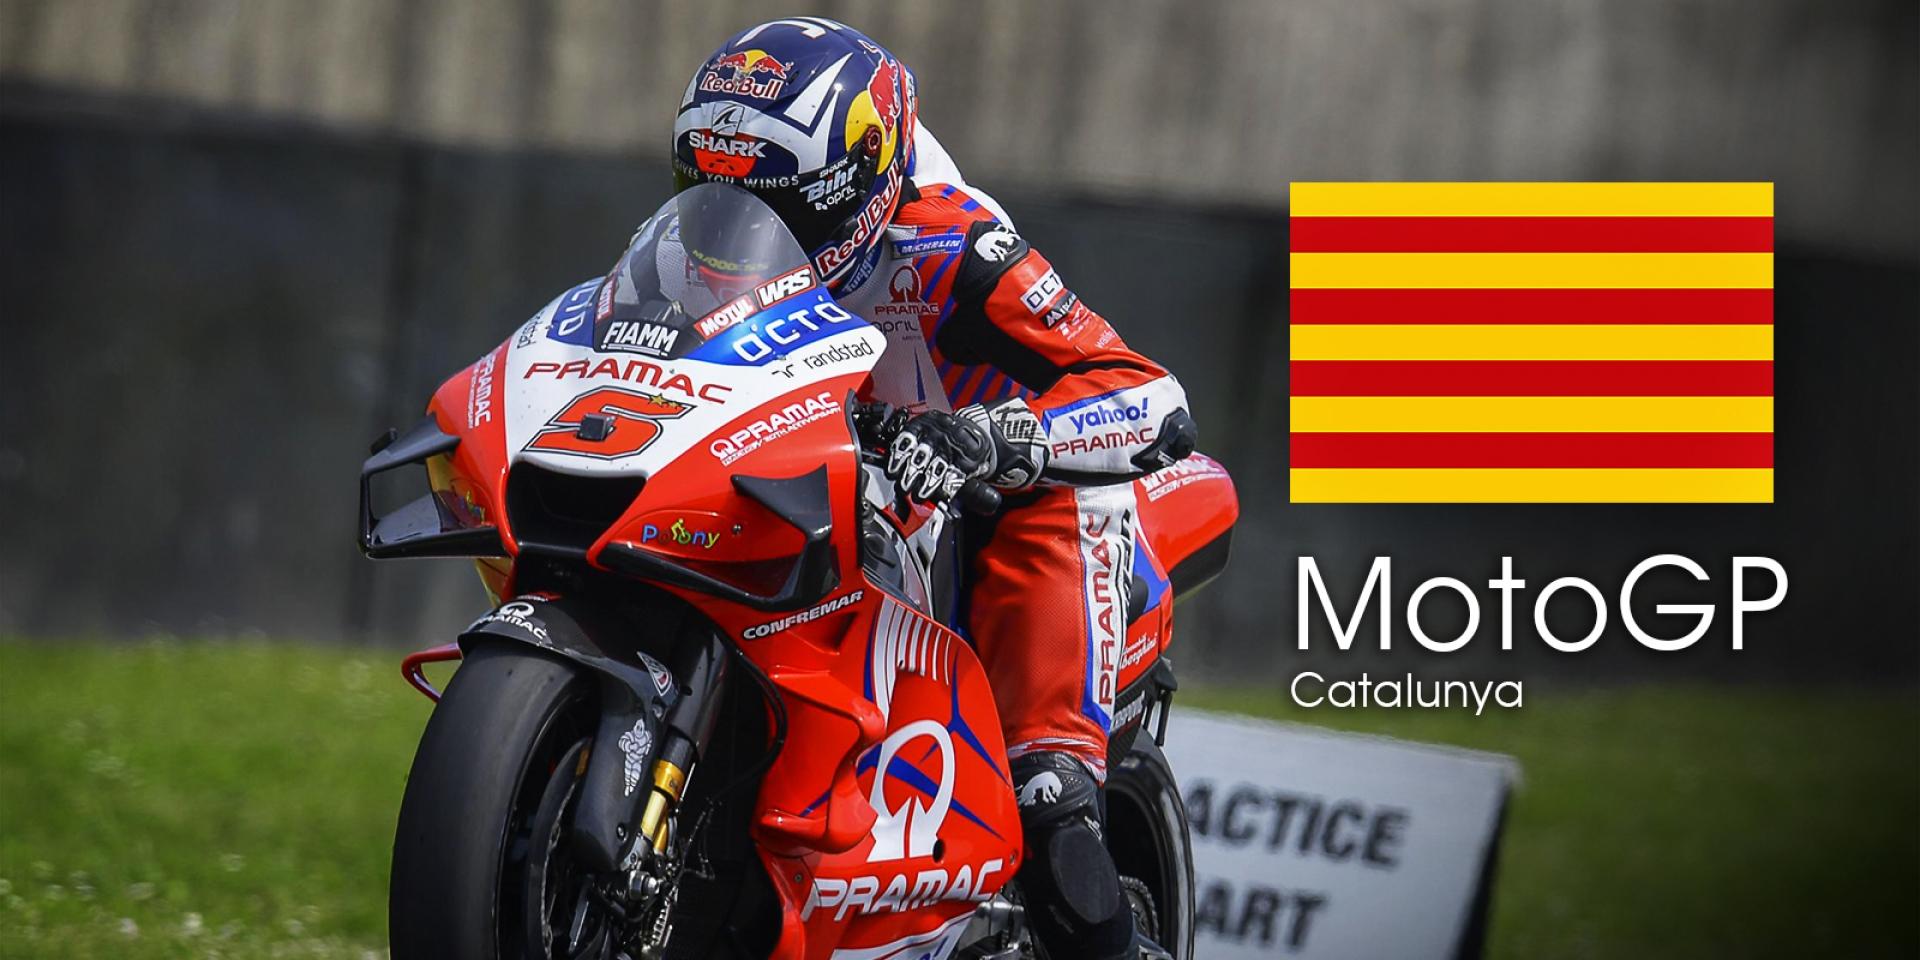 MotoGP 2021 加泰隆尼亞站 轉播時間